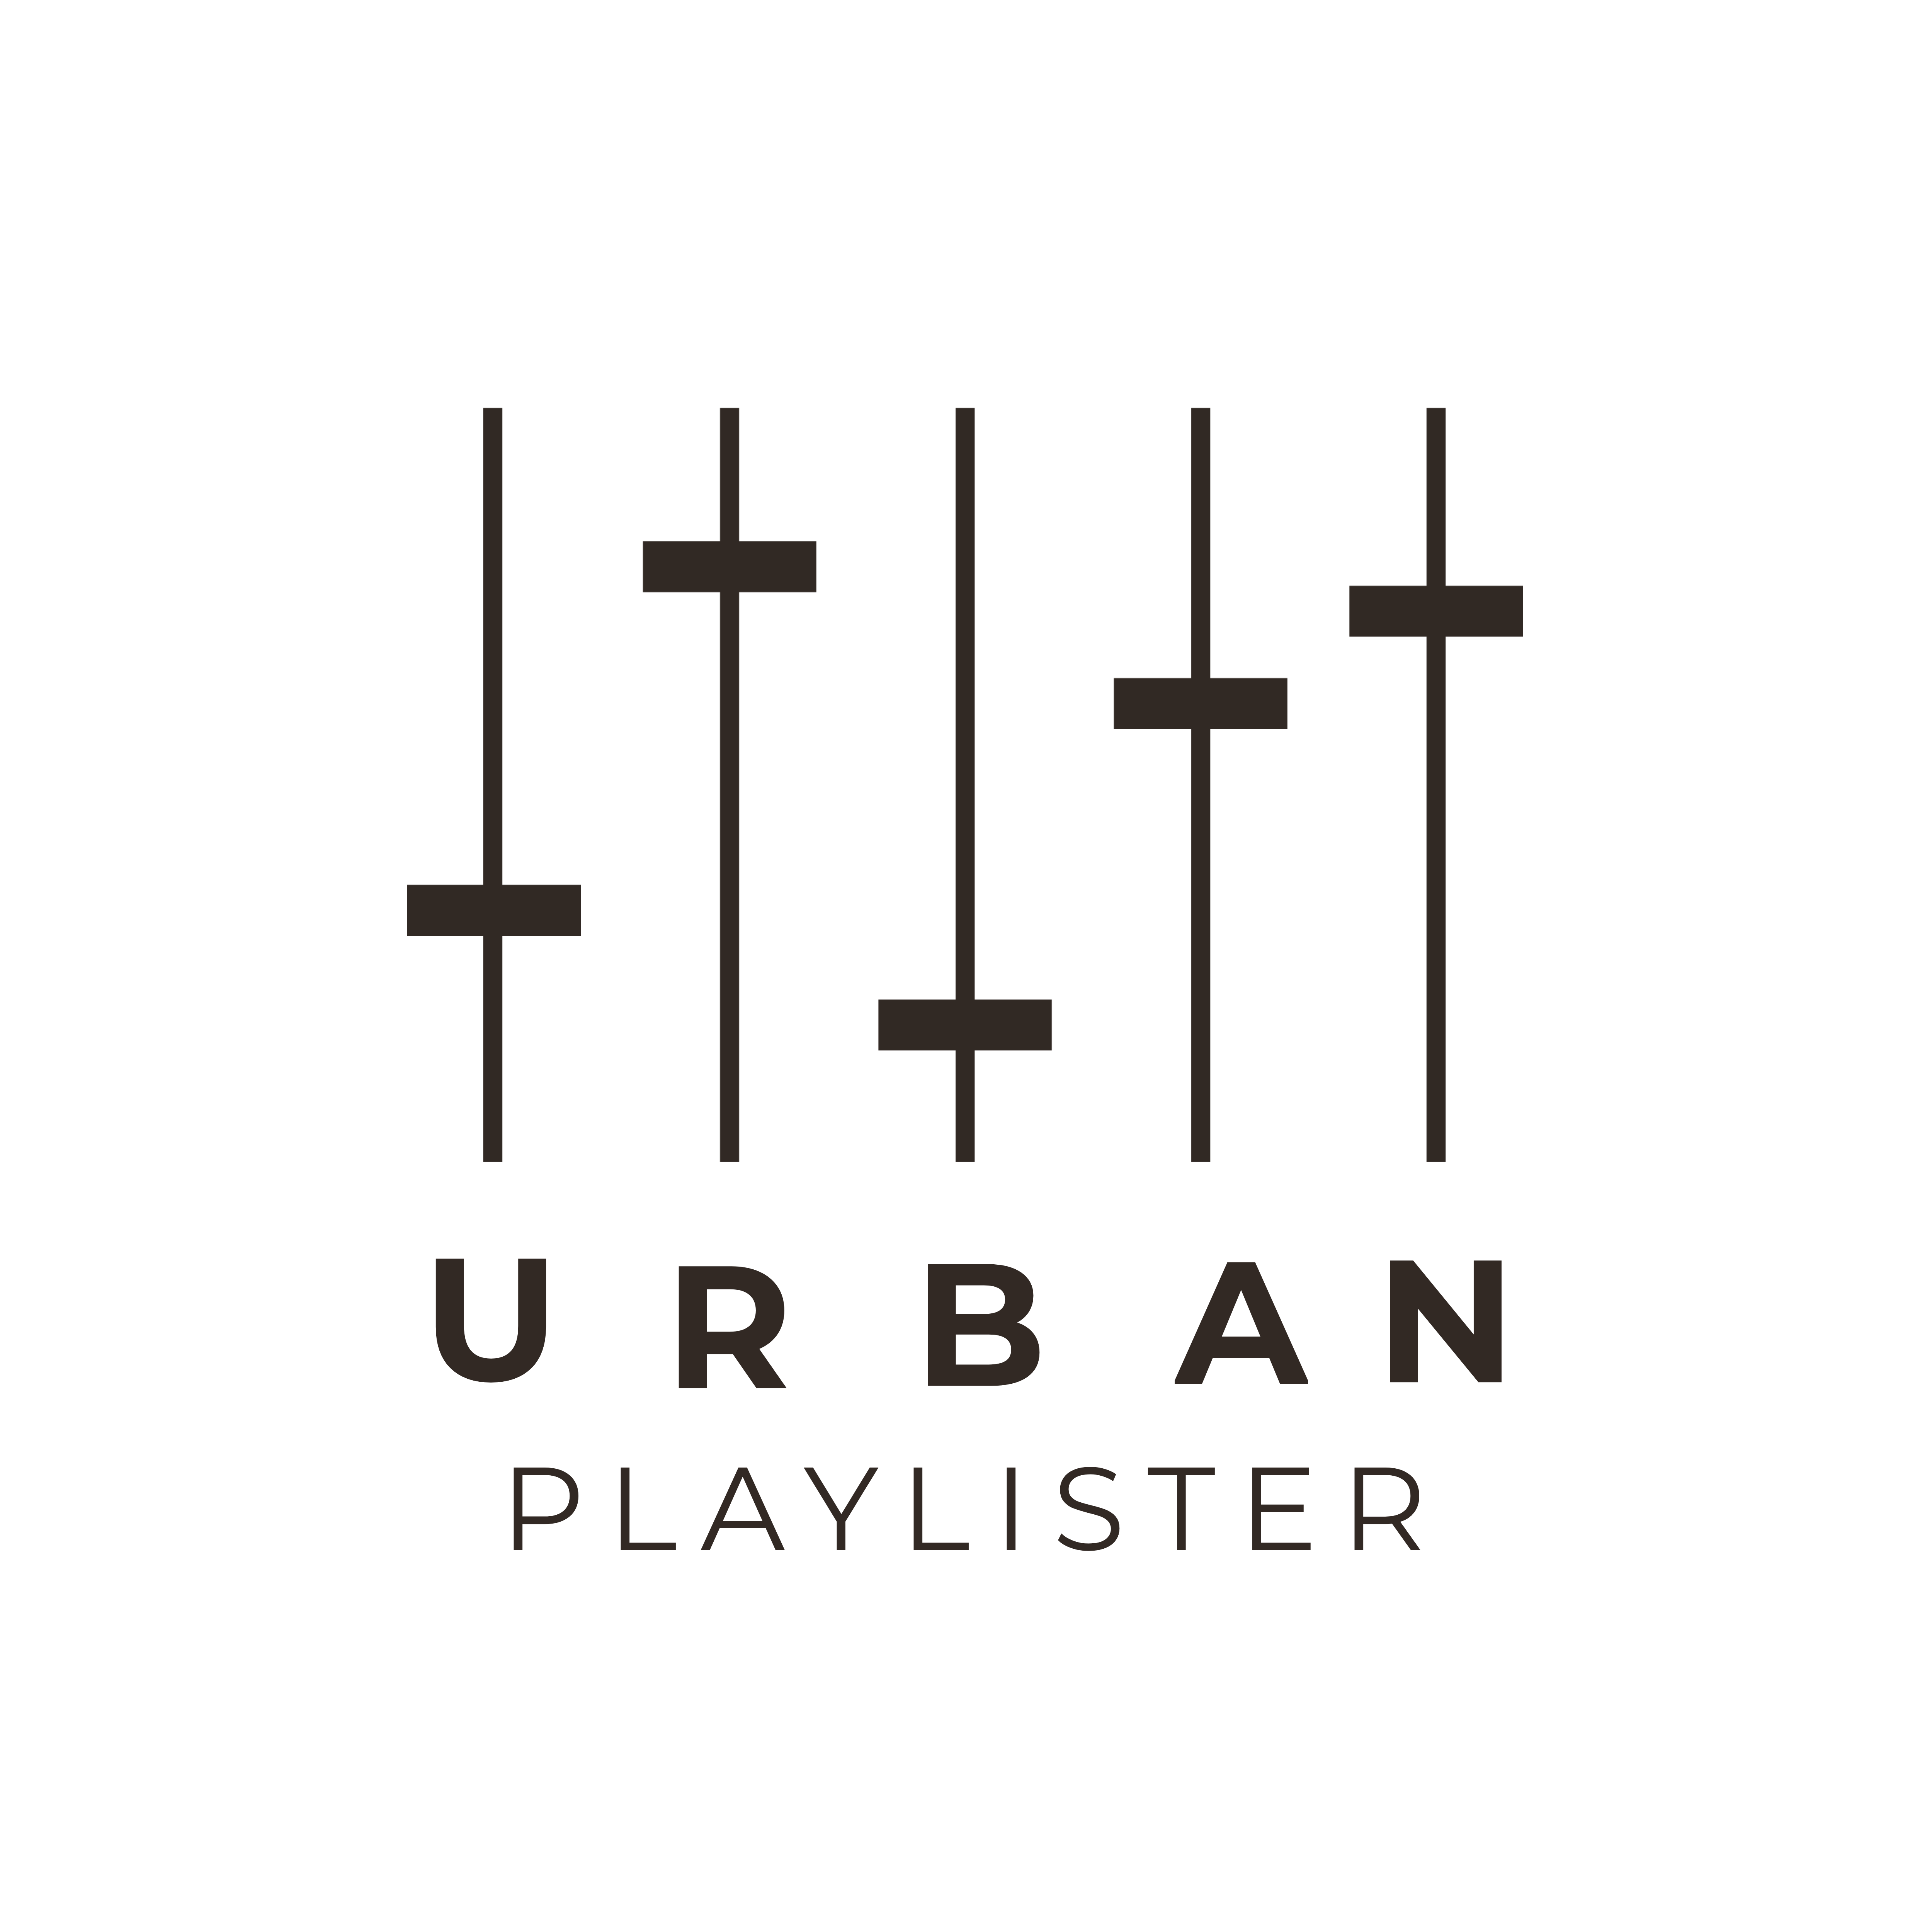 Urban Playlister